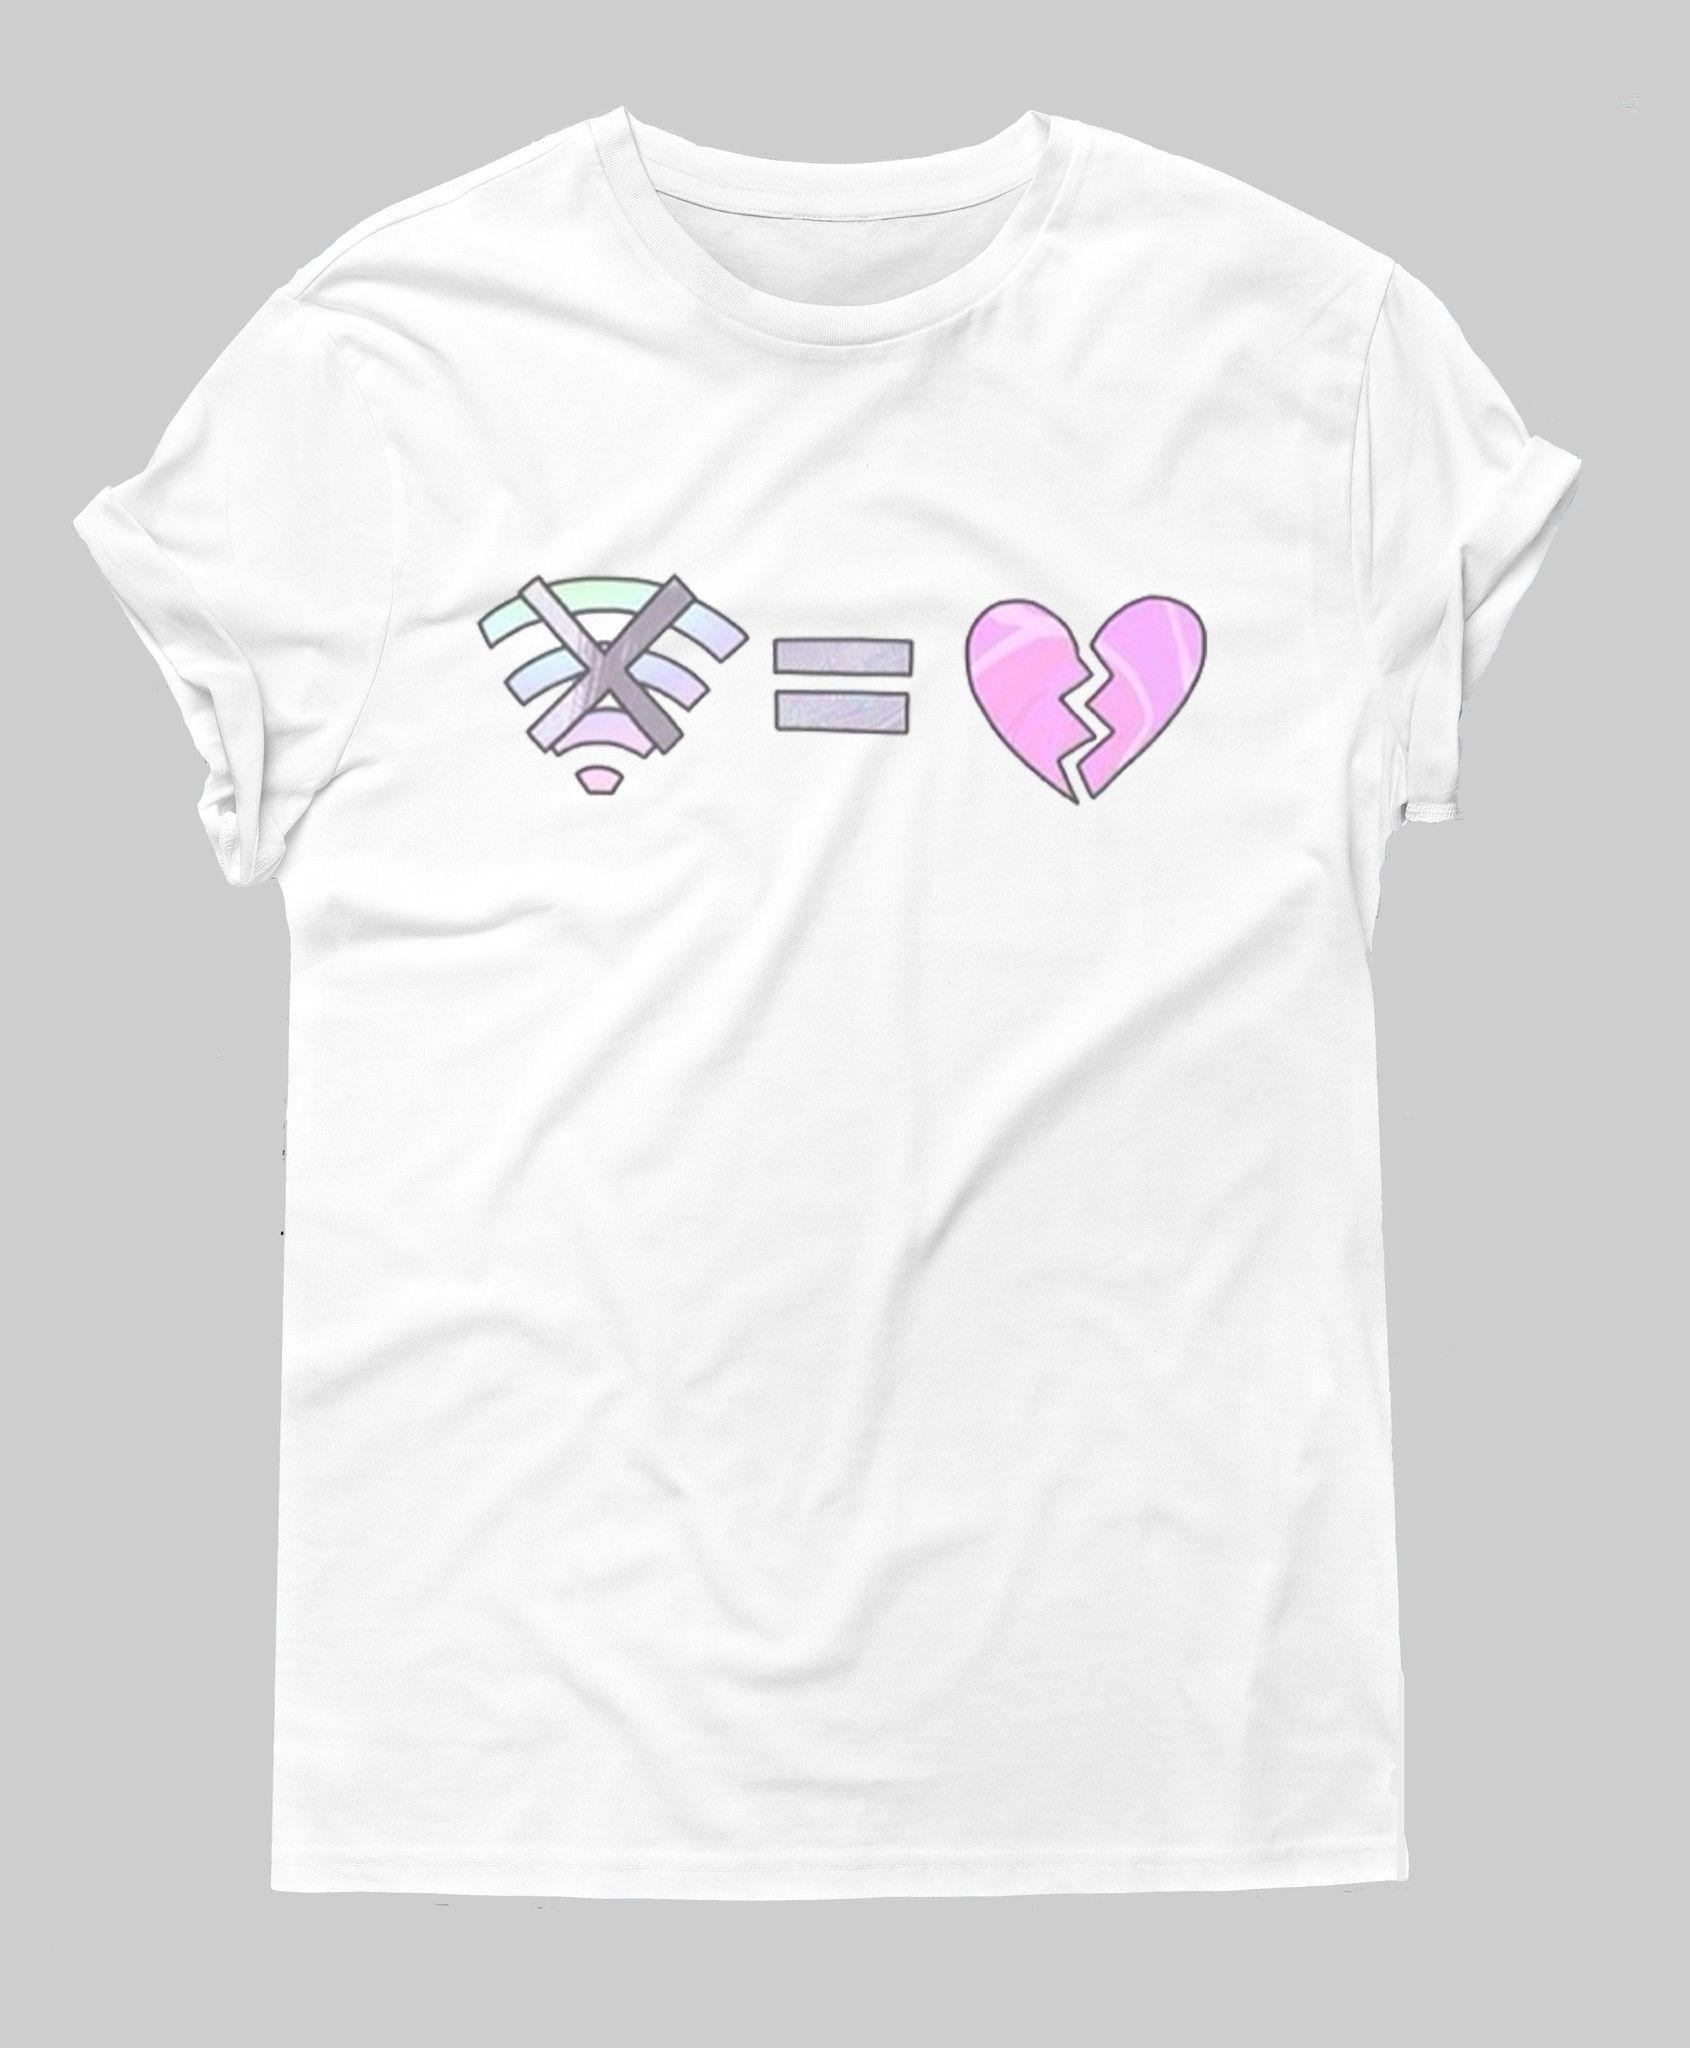 T Shirt Design Ideas Pinterest Joe Maloy